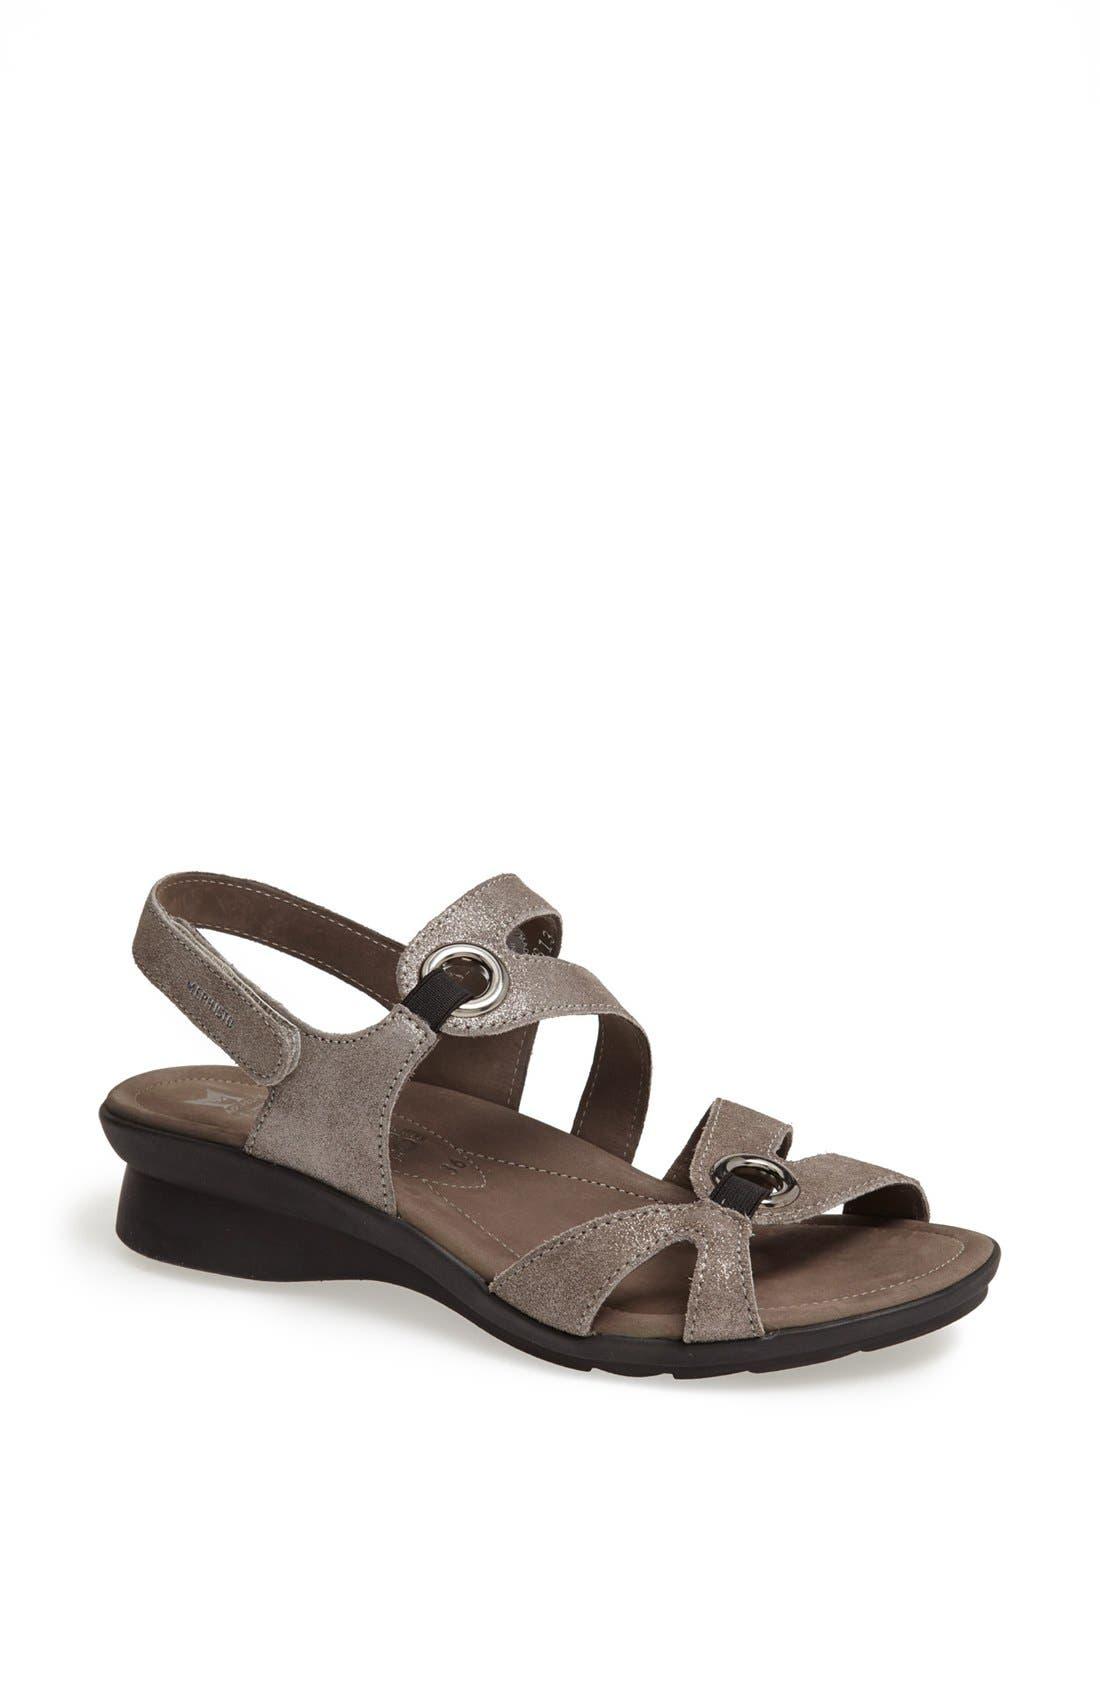 Main Image - Mephisto 'Parfolia' Sandal